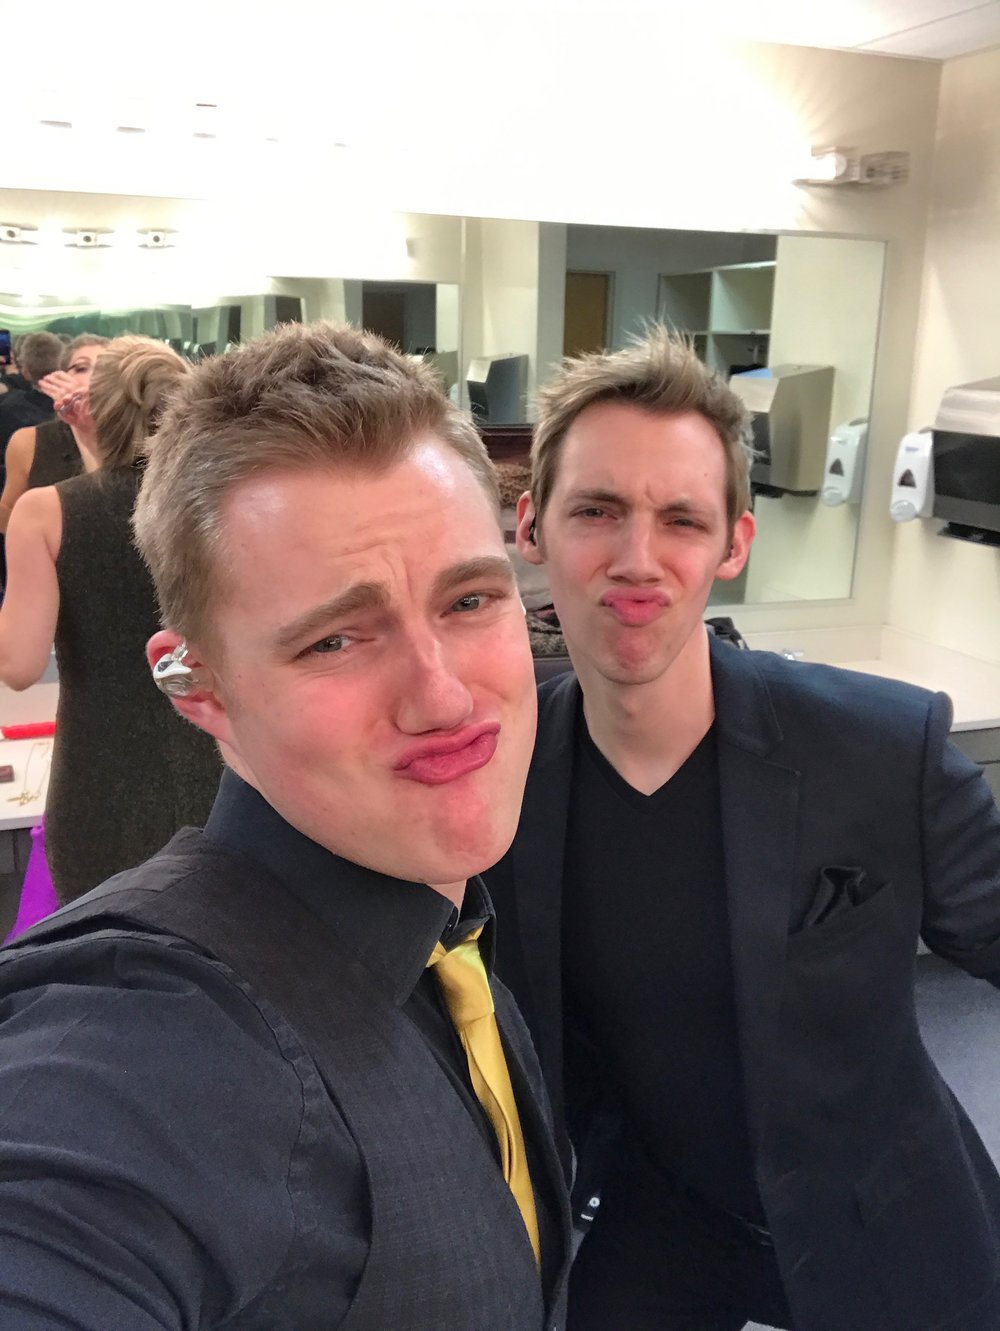 Bros.